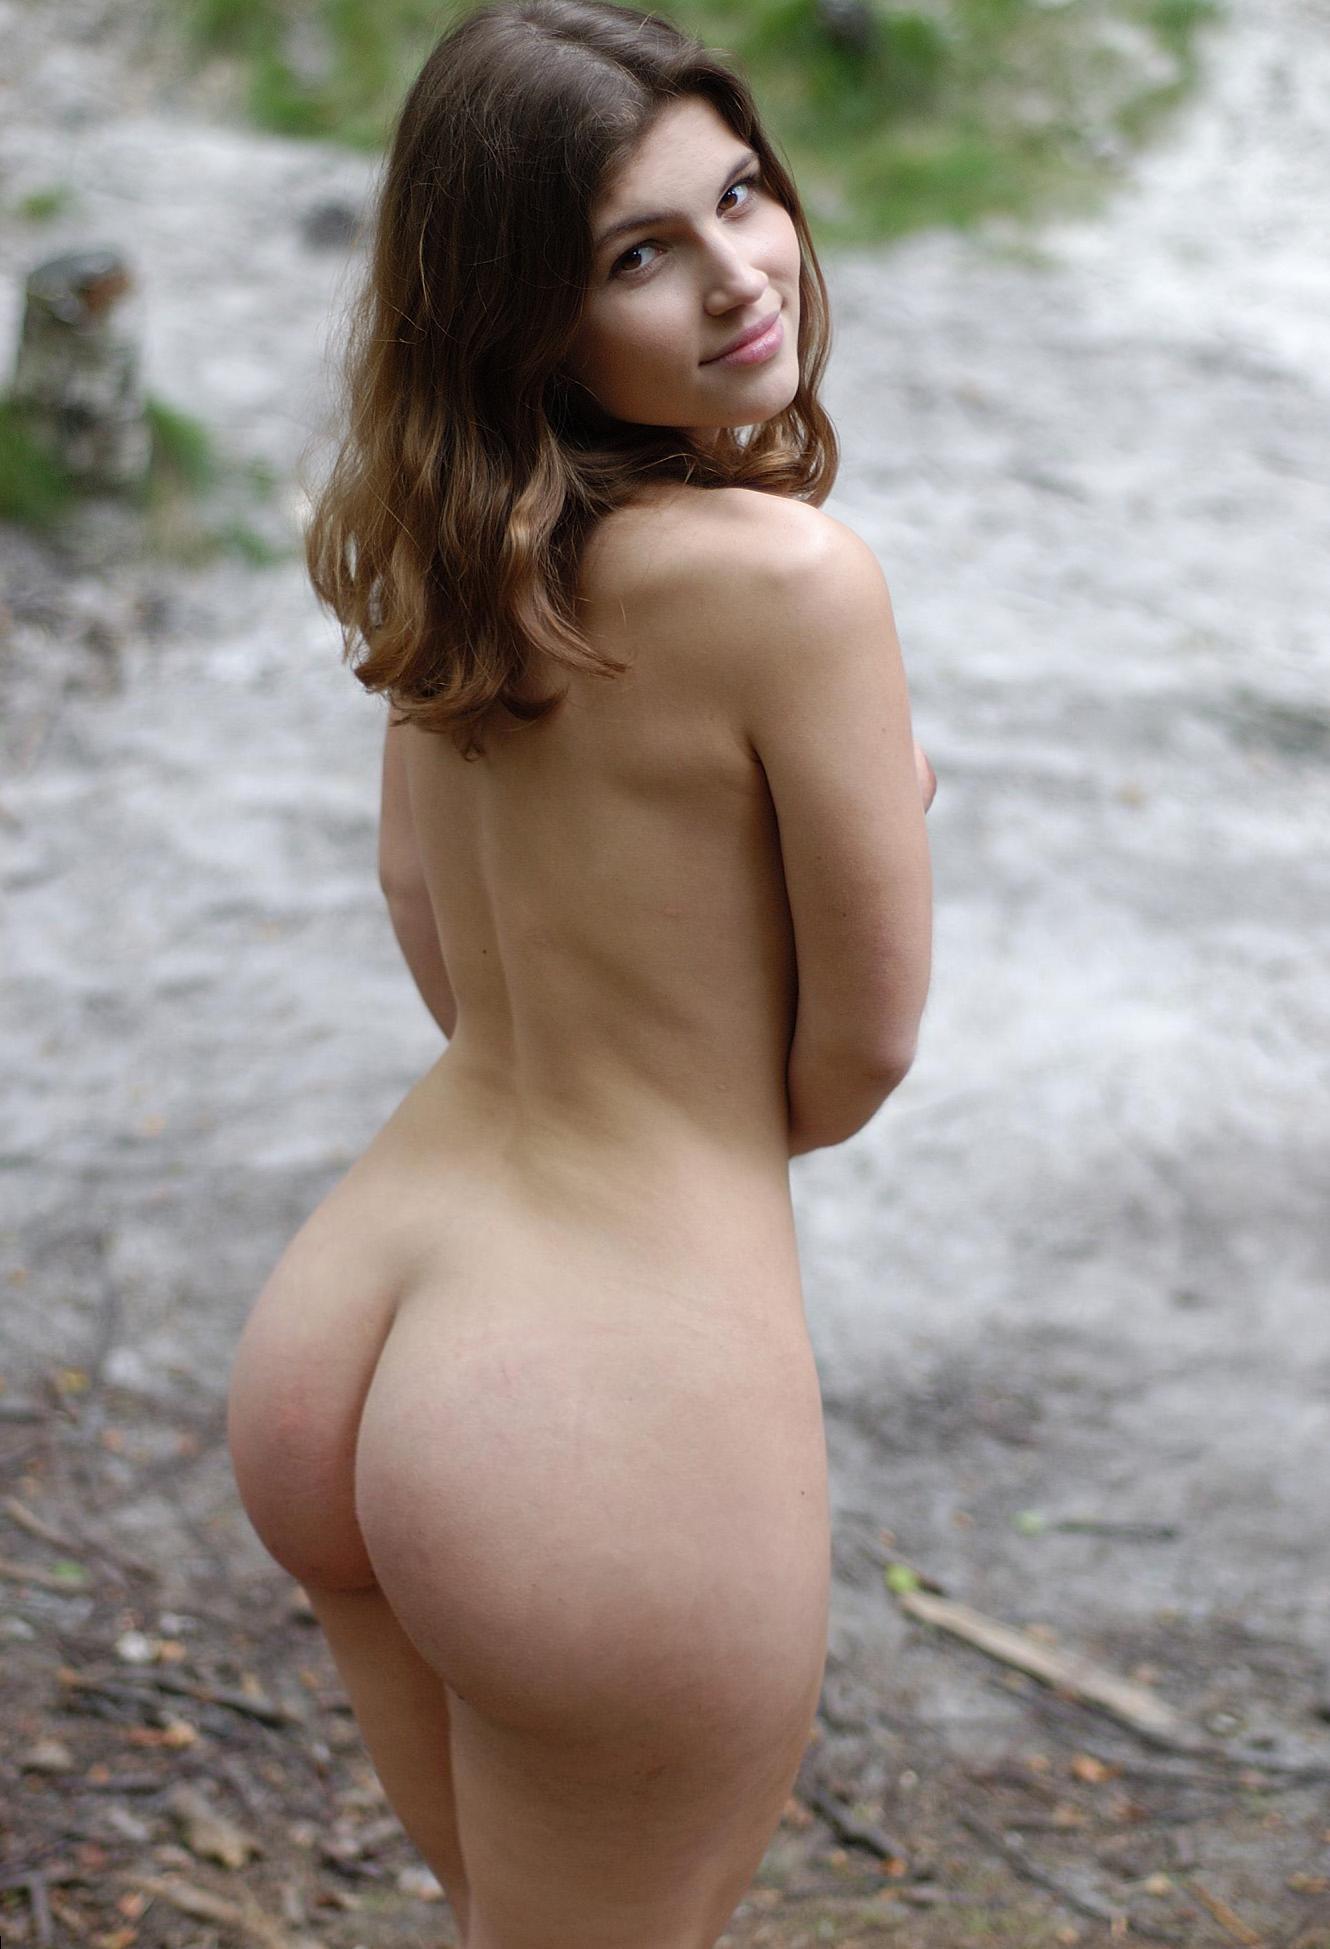 naked girl asses Outdoors